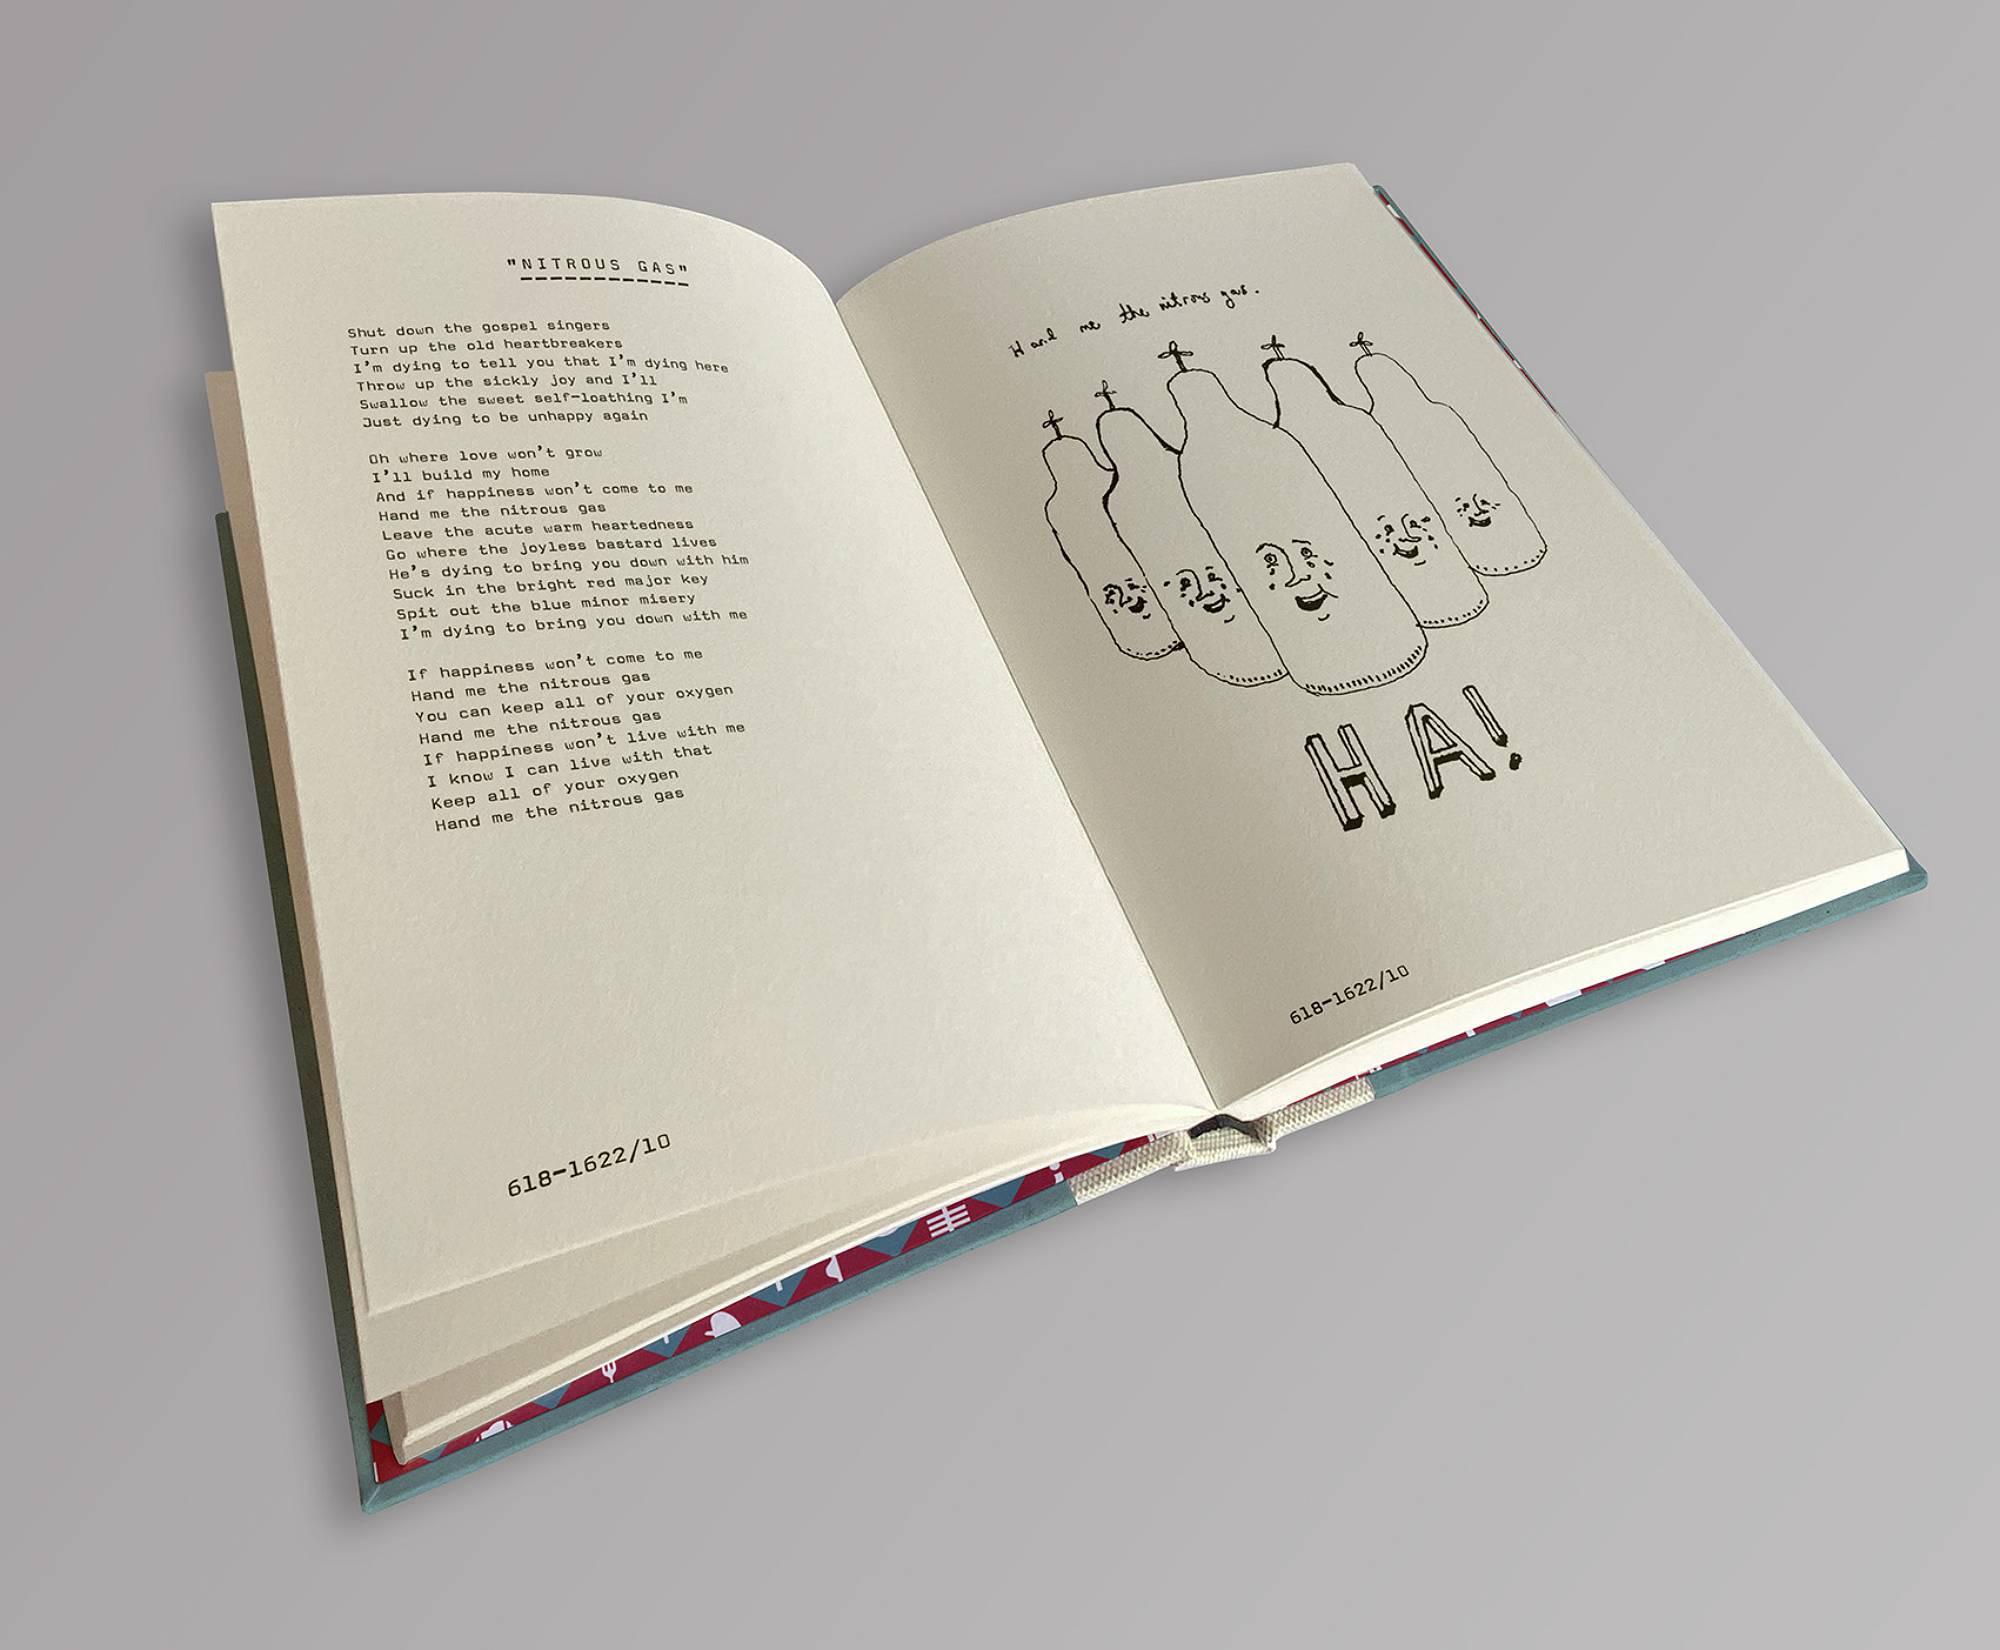 Frightened Rabbit to release Scott Hutchison lyrics limited edition book. Credit: Press